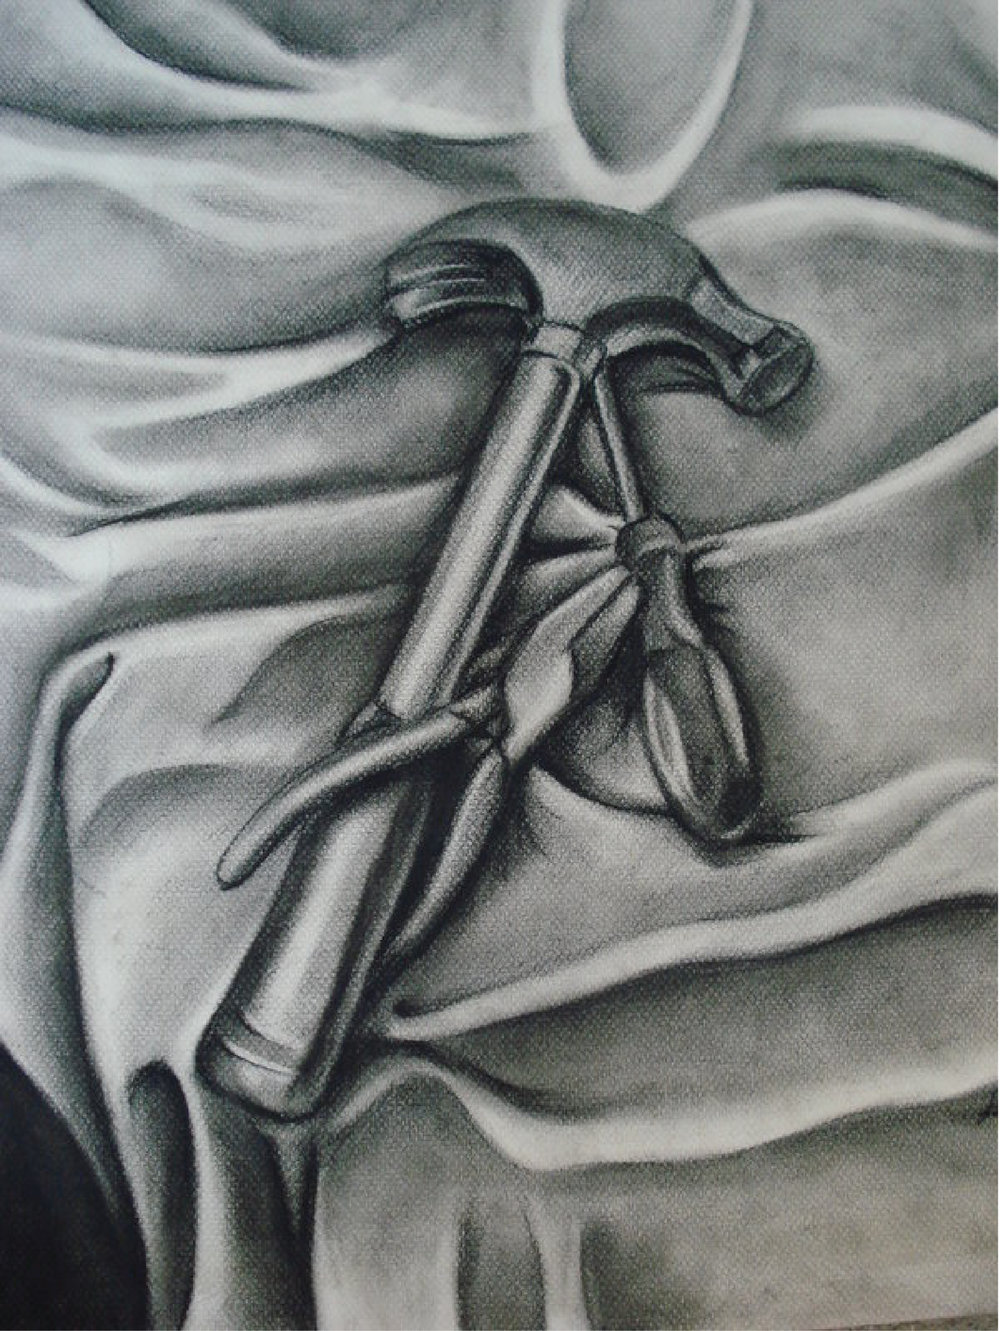 Tools, charcoal, 2007